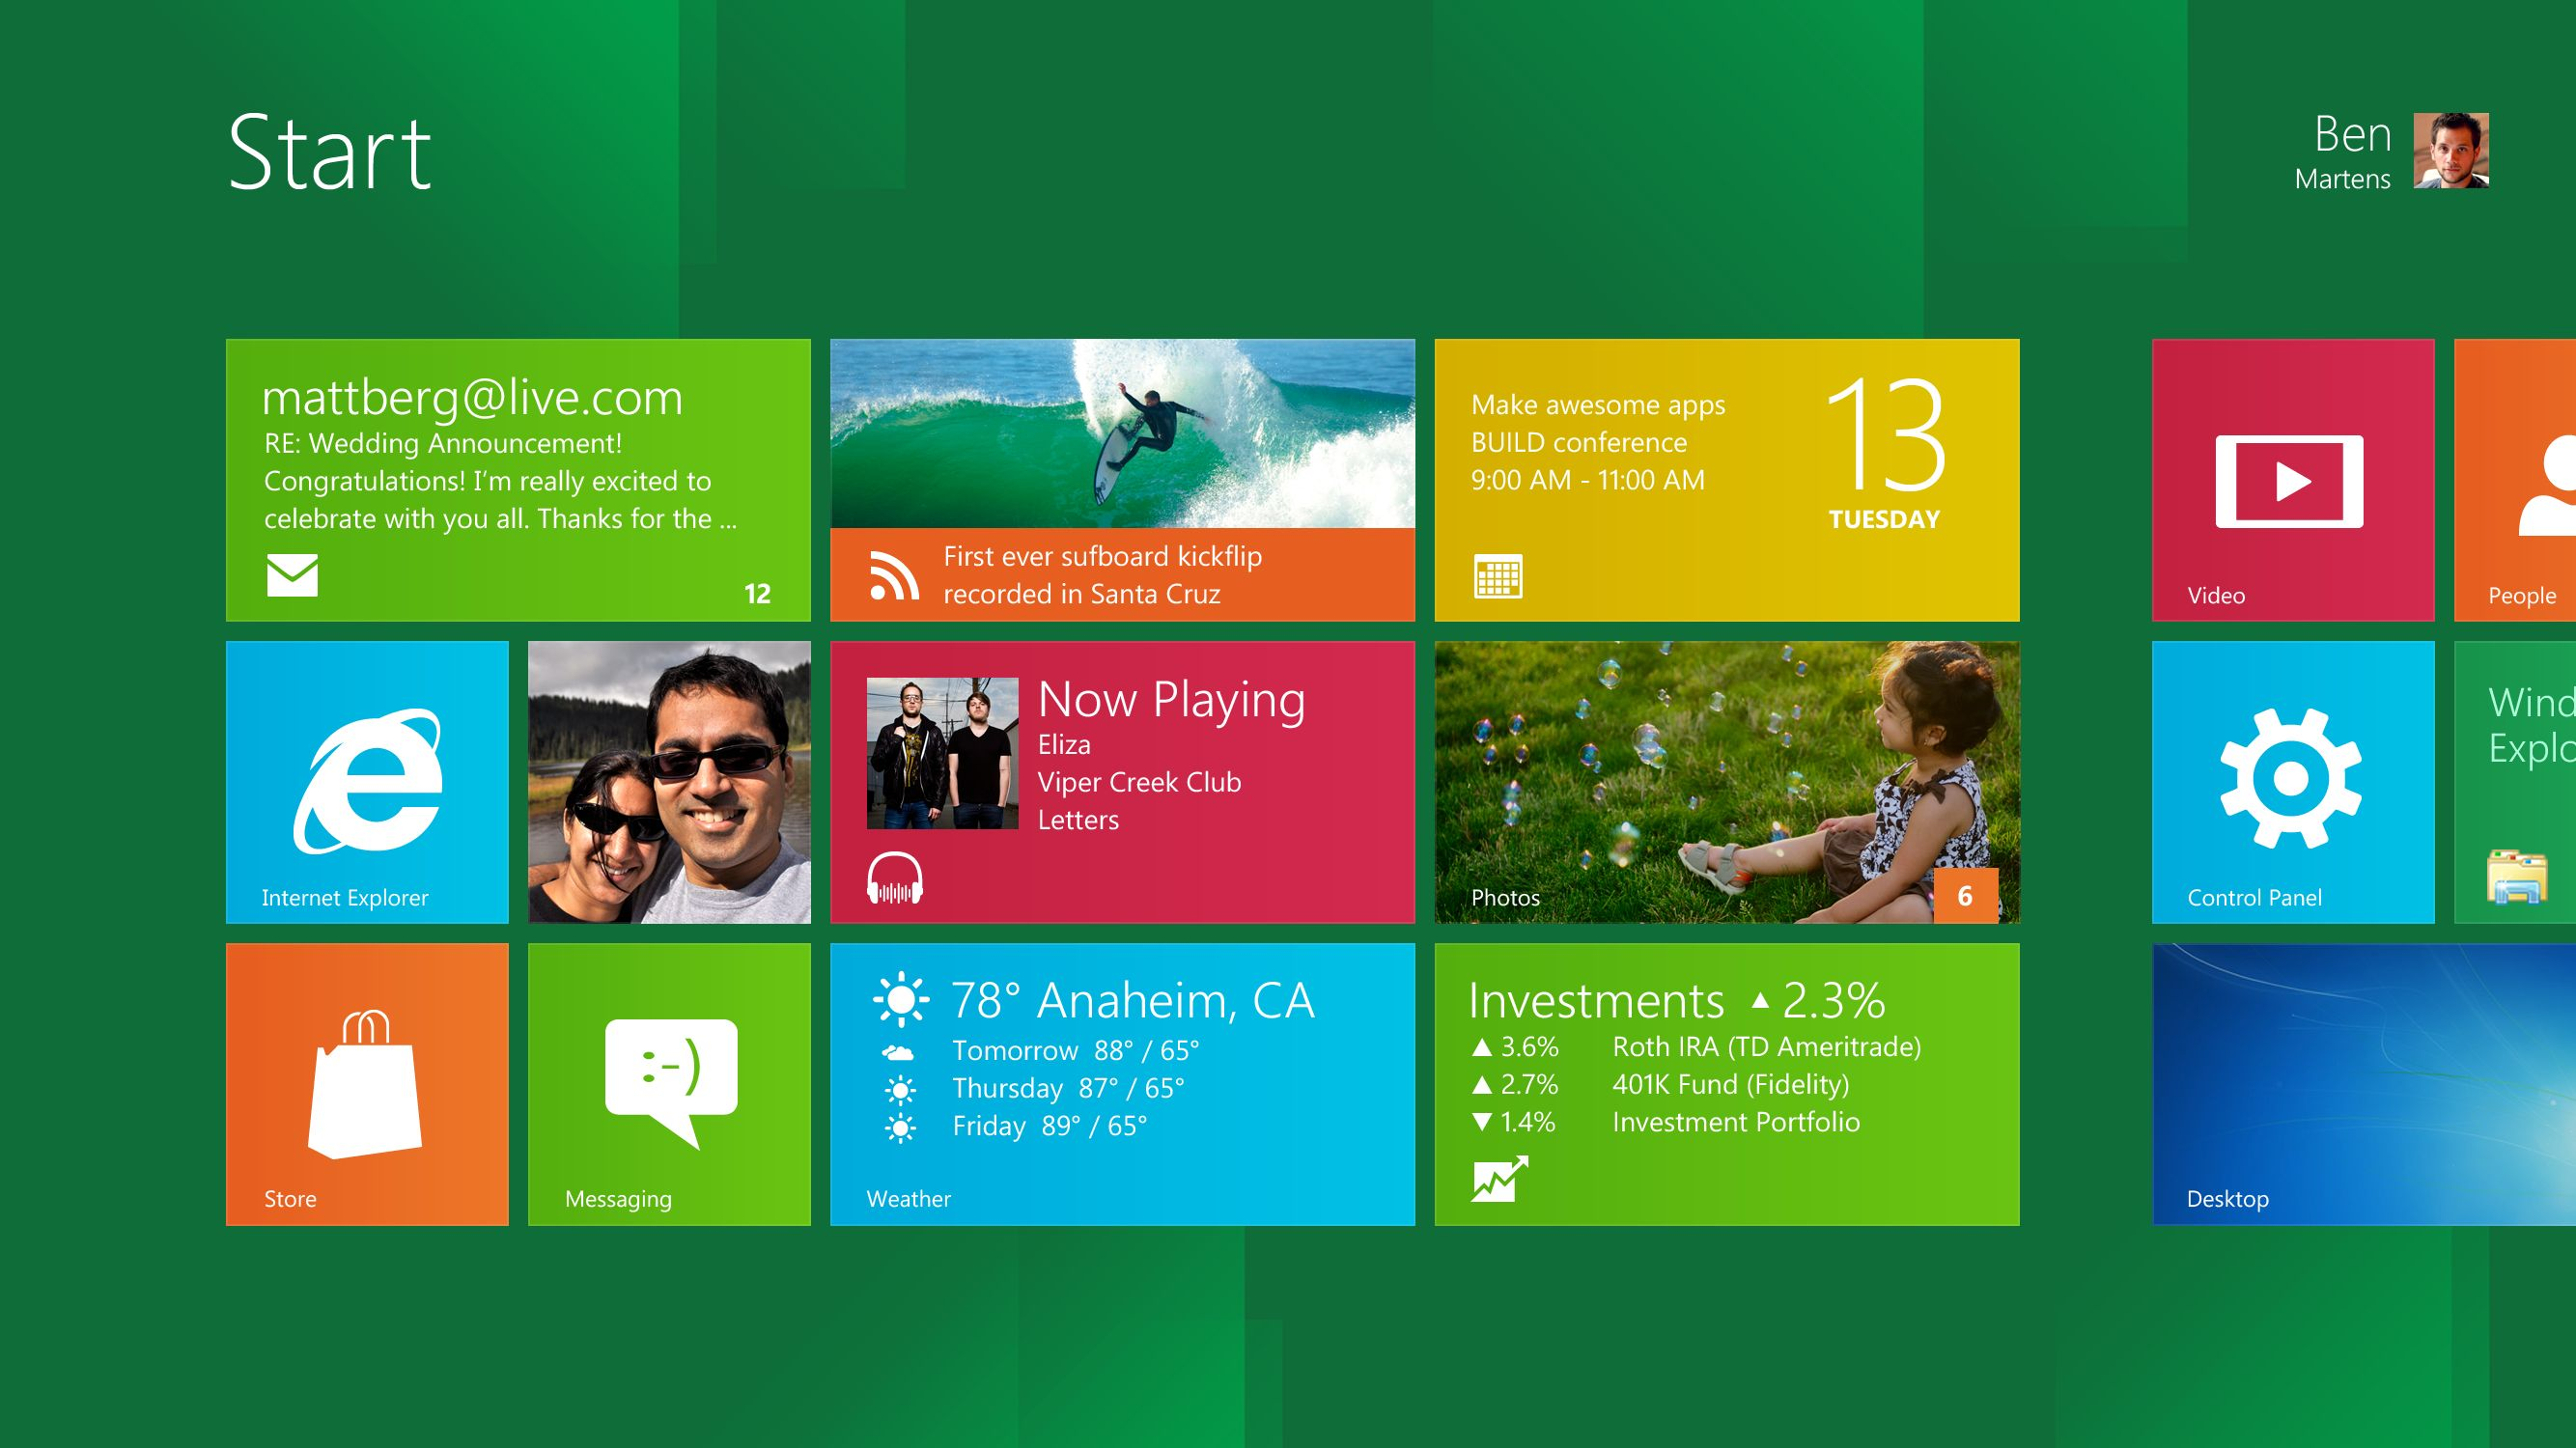 Wypr�buj Windows 8 Developer Preview (odno�niki do pobrania plik�w .iso)